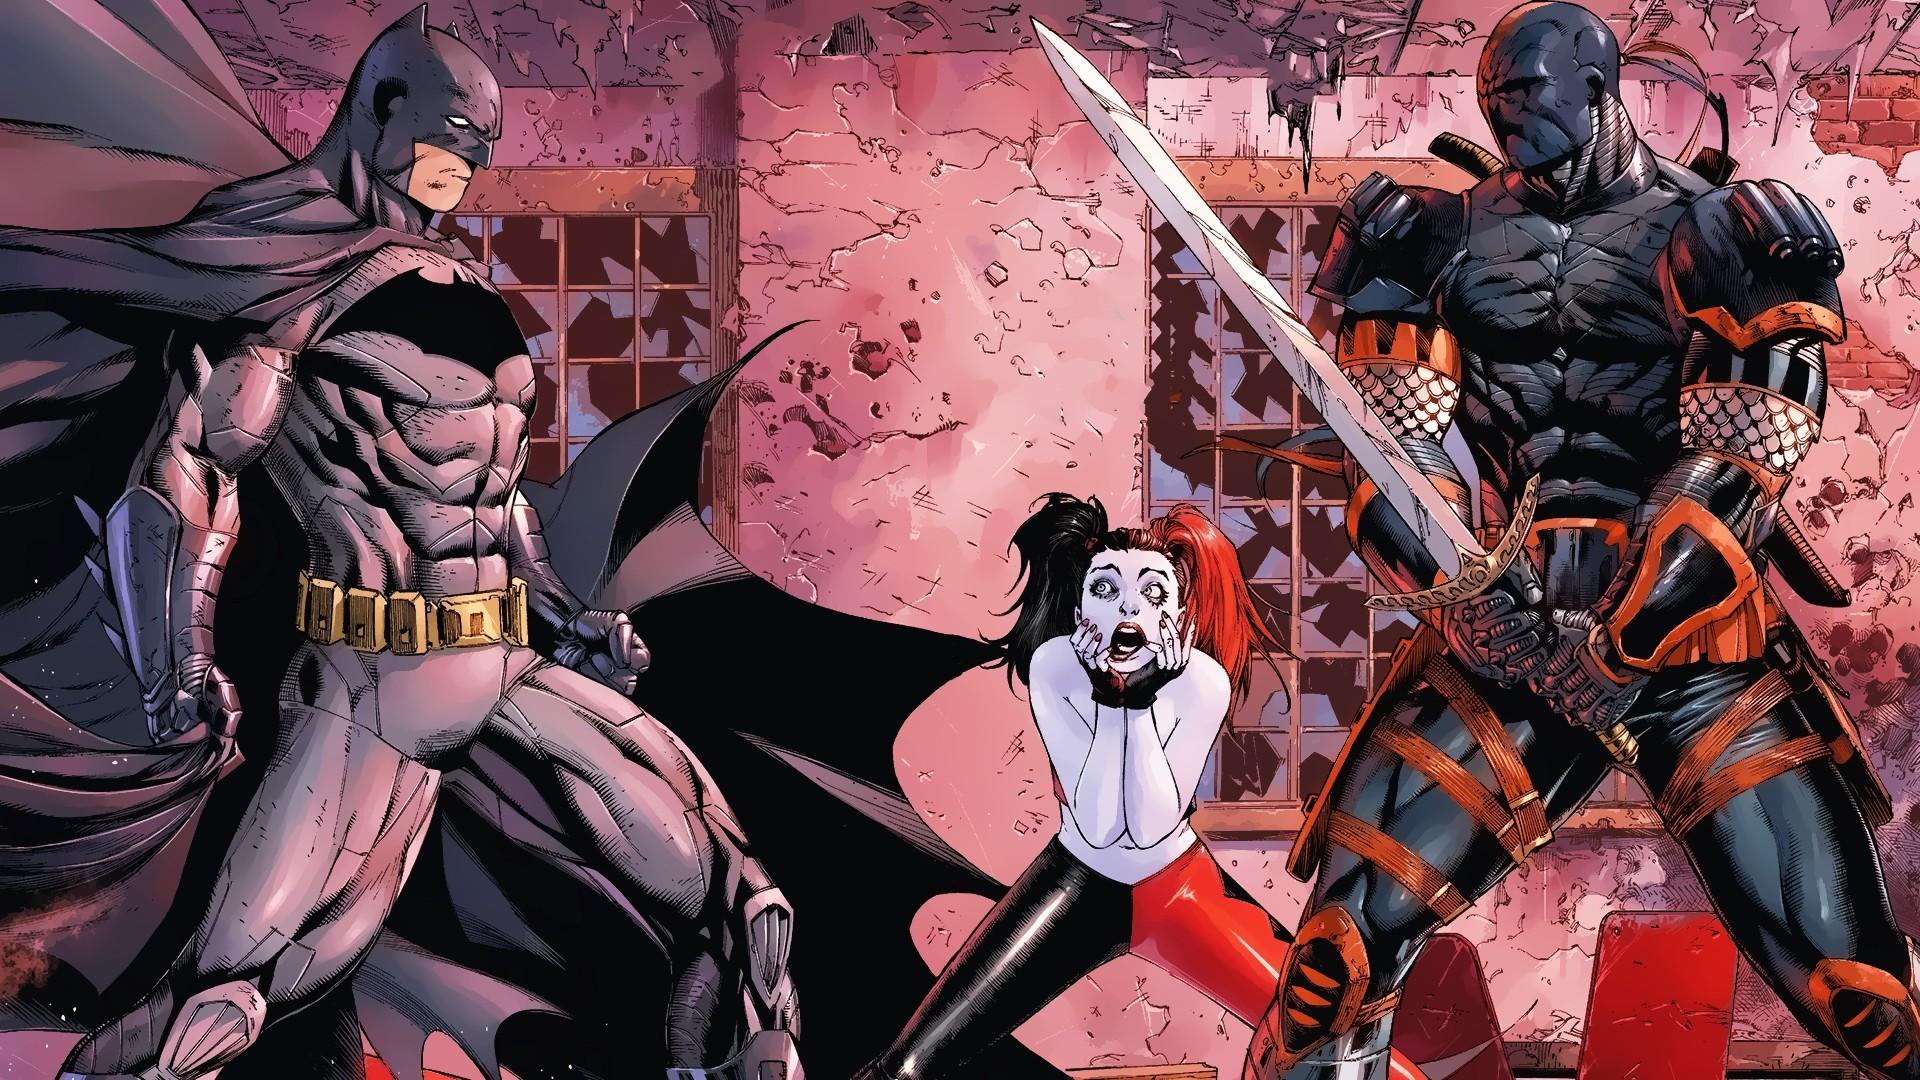 Batman Vs Deathstroke Full HD Wallpaper And Background Image